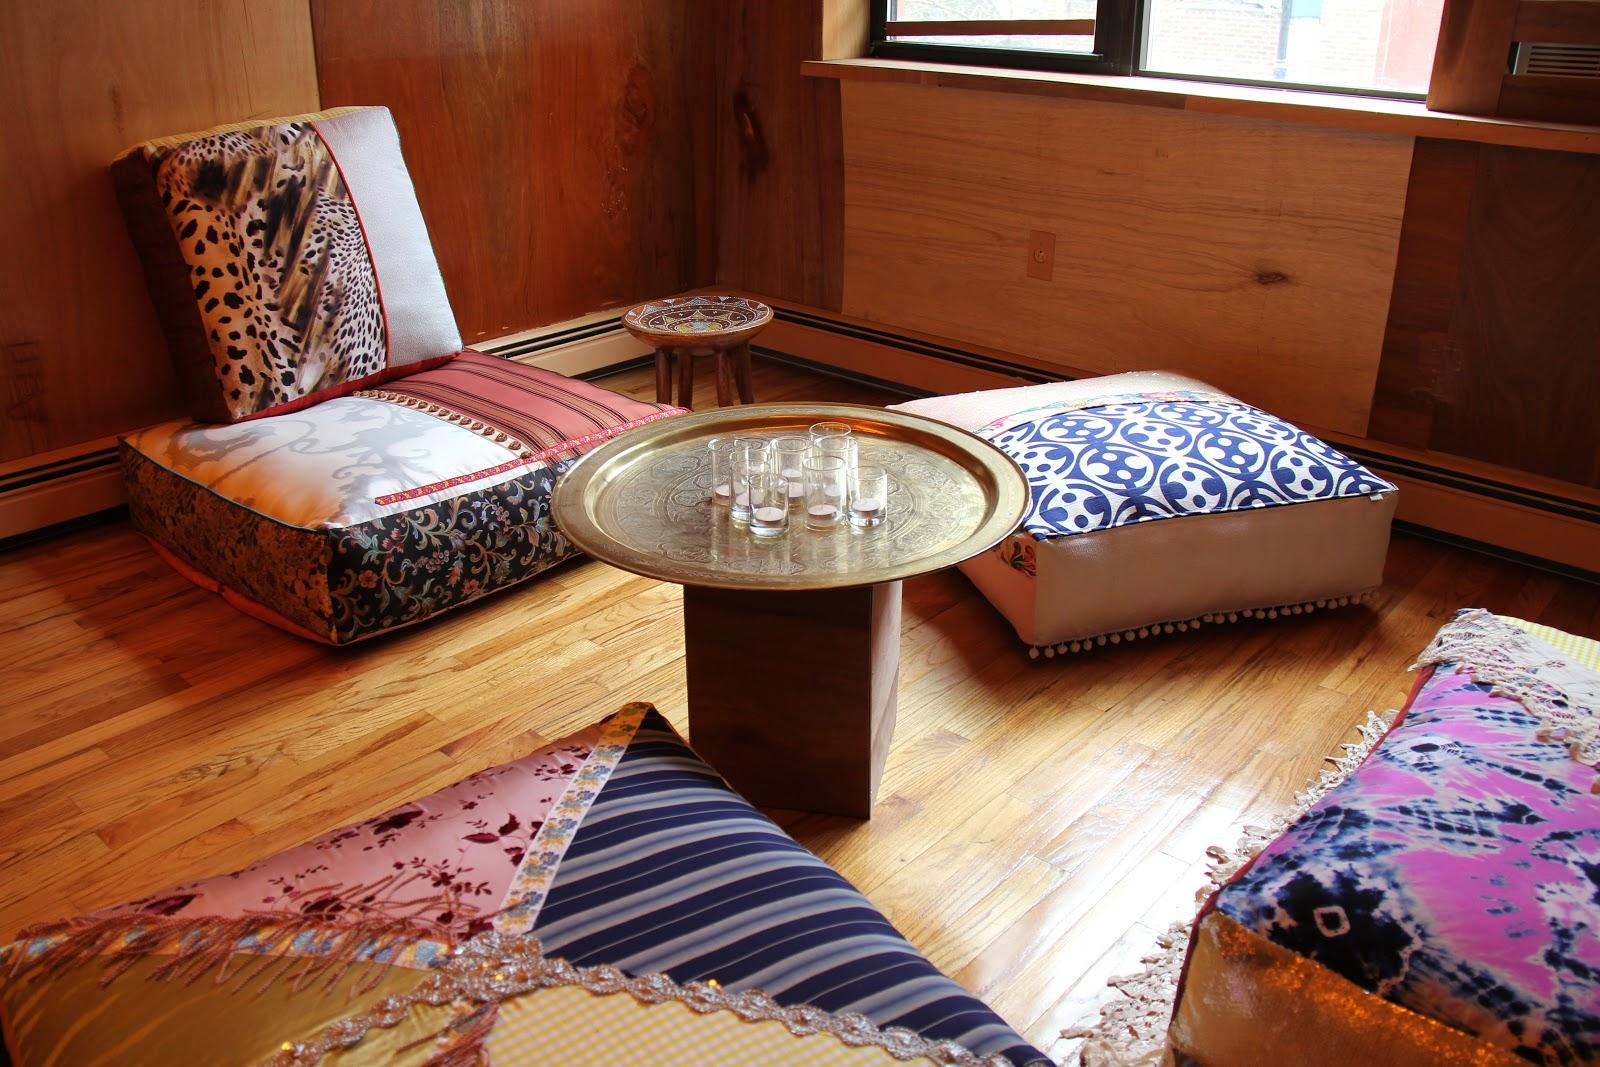 Turkish Floor Pillows - Flooring Ideas and Inspiration